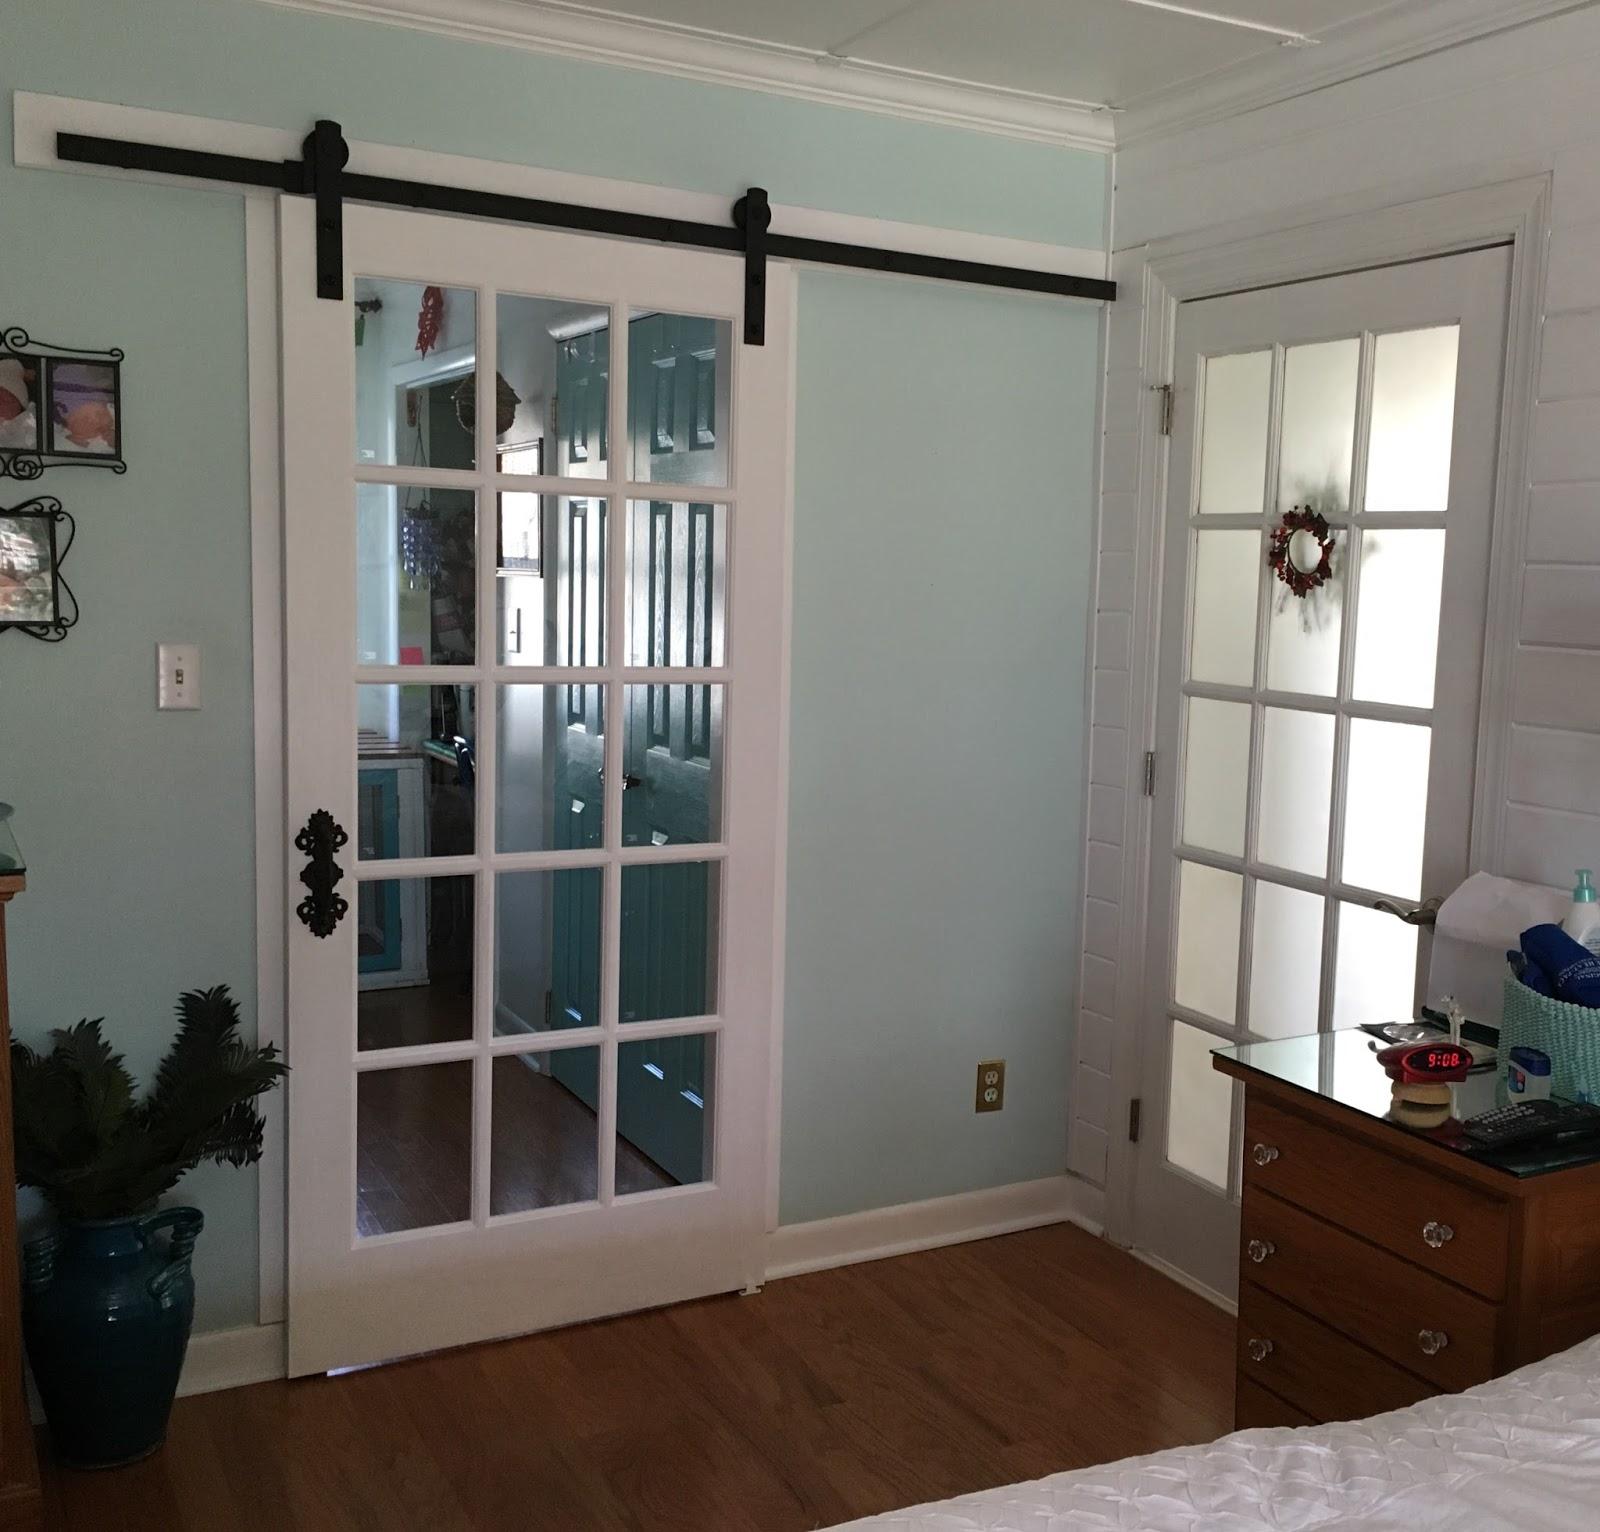 Repurposed For Life Another Barn Door